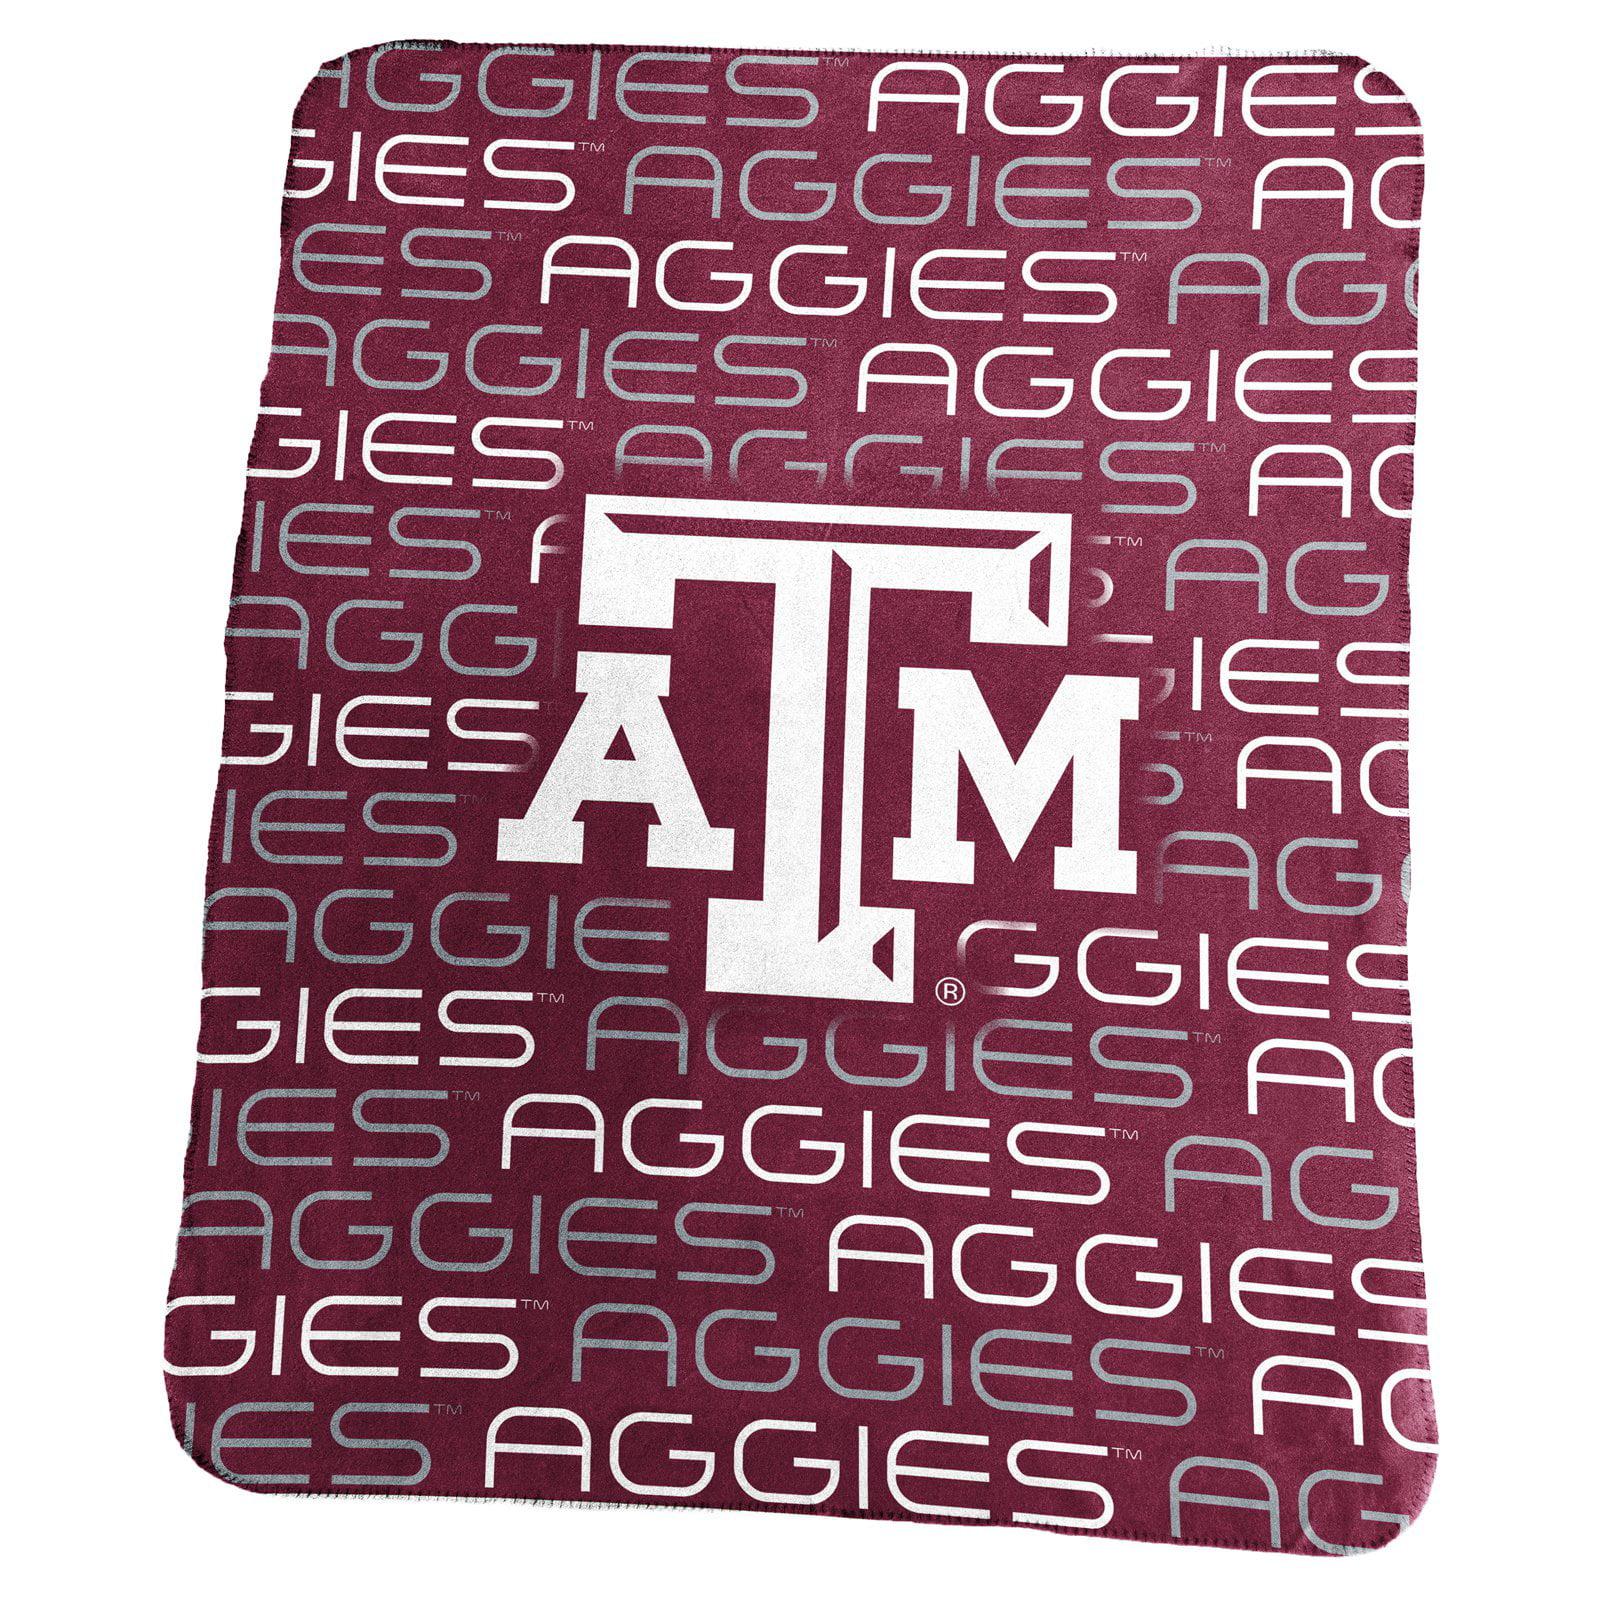 TX A&M Aggies Classic Fleece